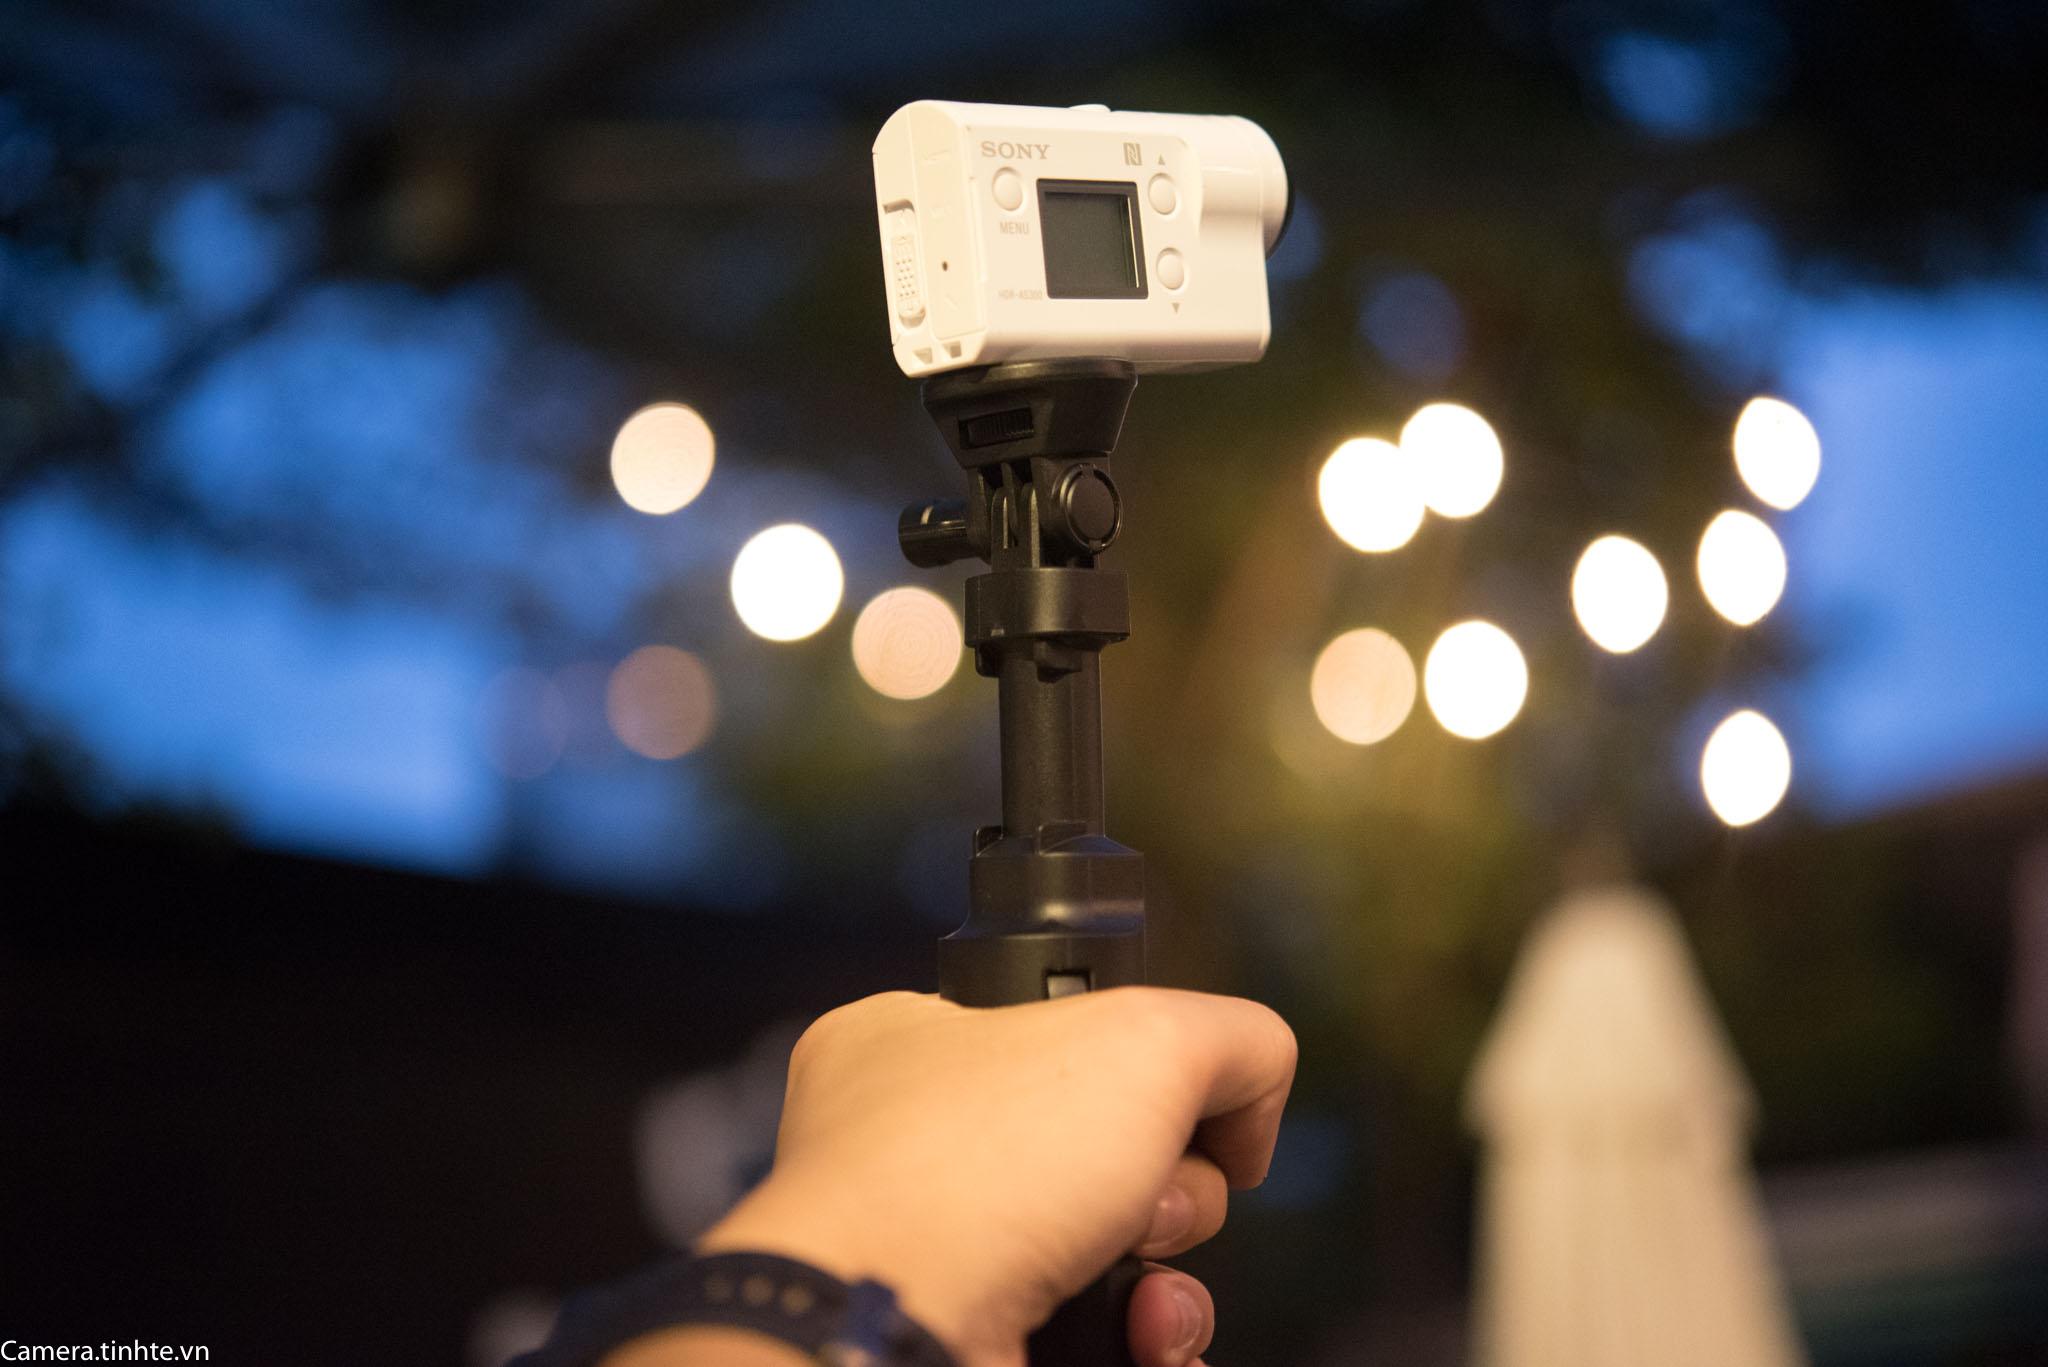 Phu kien Sony FDR-X3000 - Camera.tinhte.vn -7-2.jpg